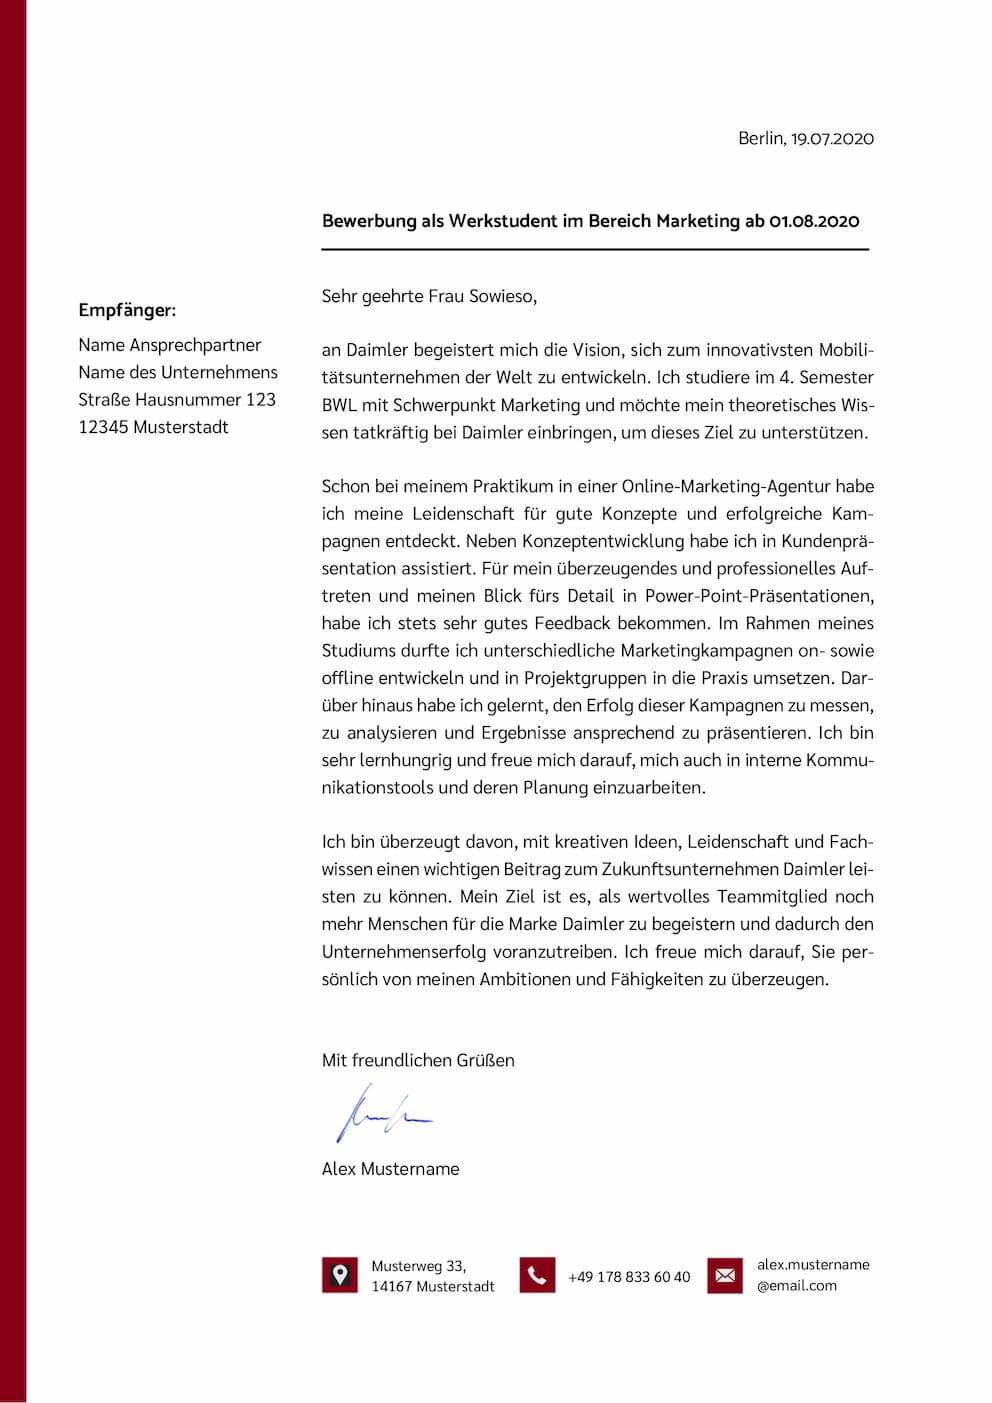 Login Daimler Bewerbung Or Register New Account 7